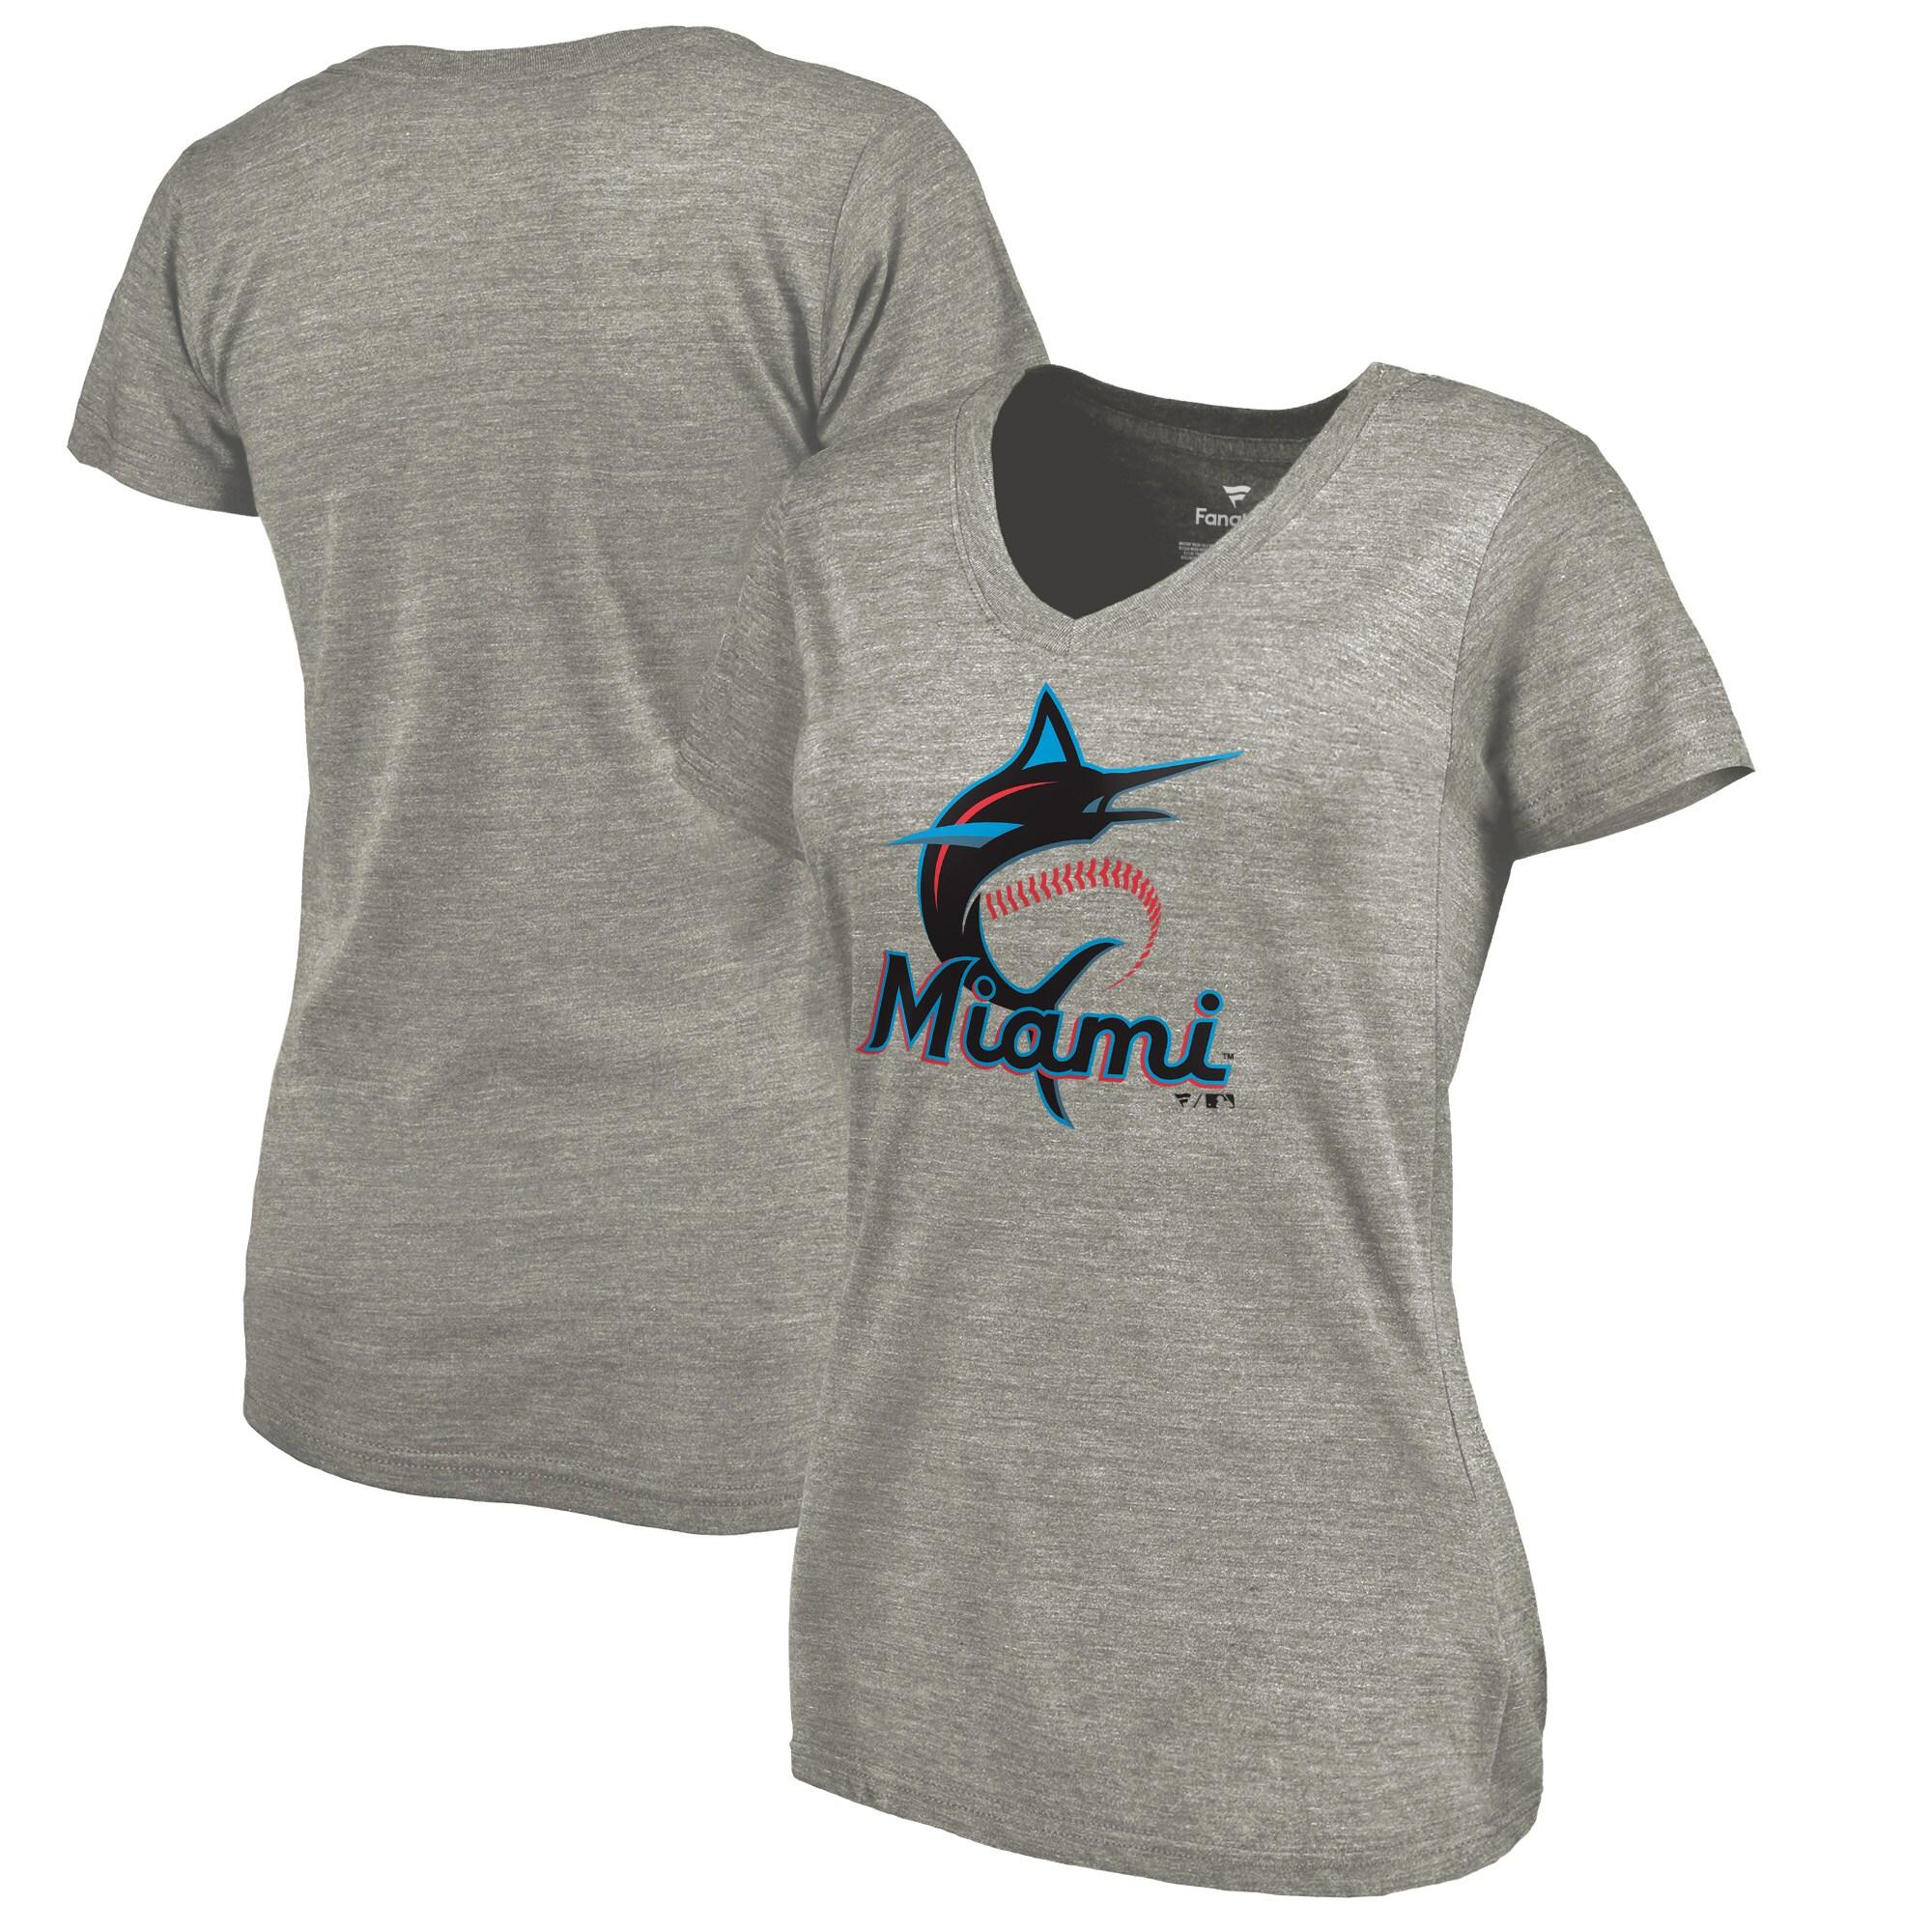 Miami Marlins Women's Primary Logo Tri-Blend V-Neck T-Shirt - Ash